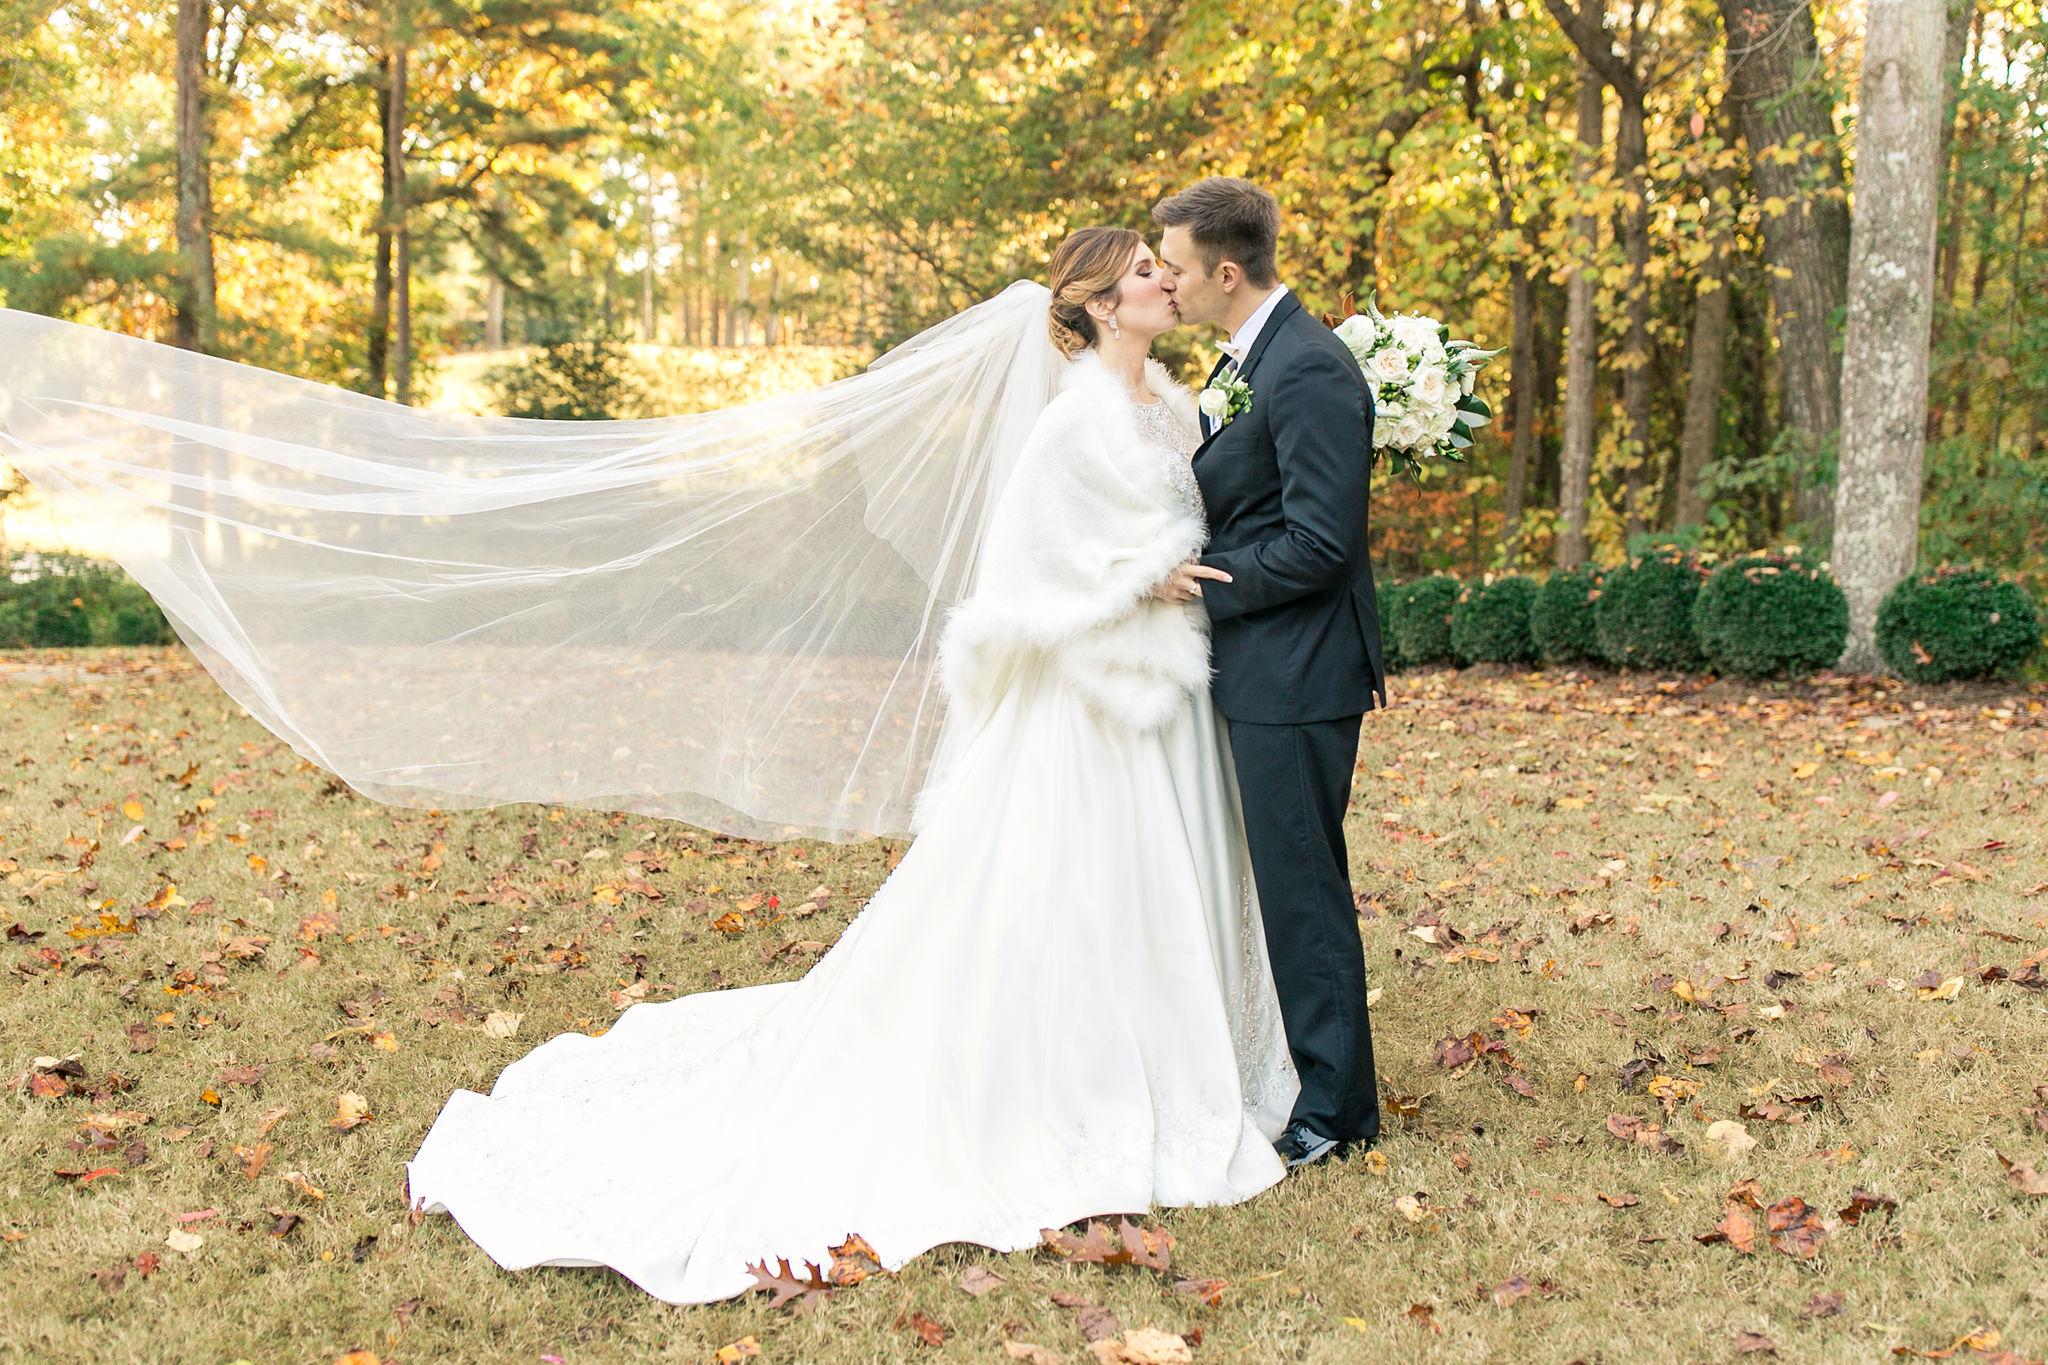 SavannahEvePhotography-Bottiglion-ScopeWedding-Bride&Groom-4.jpg